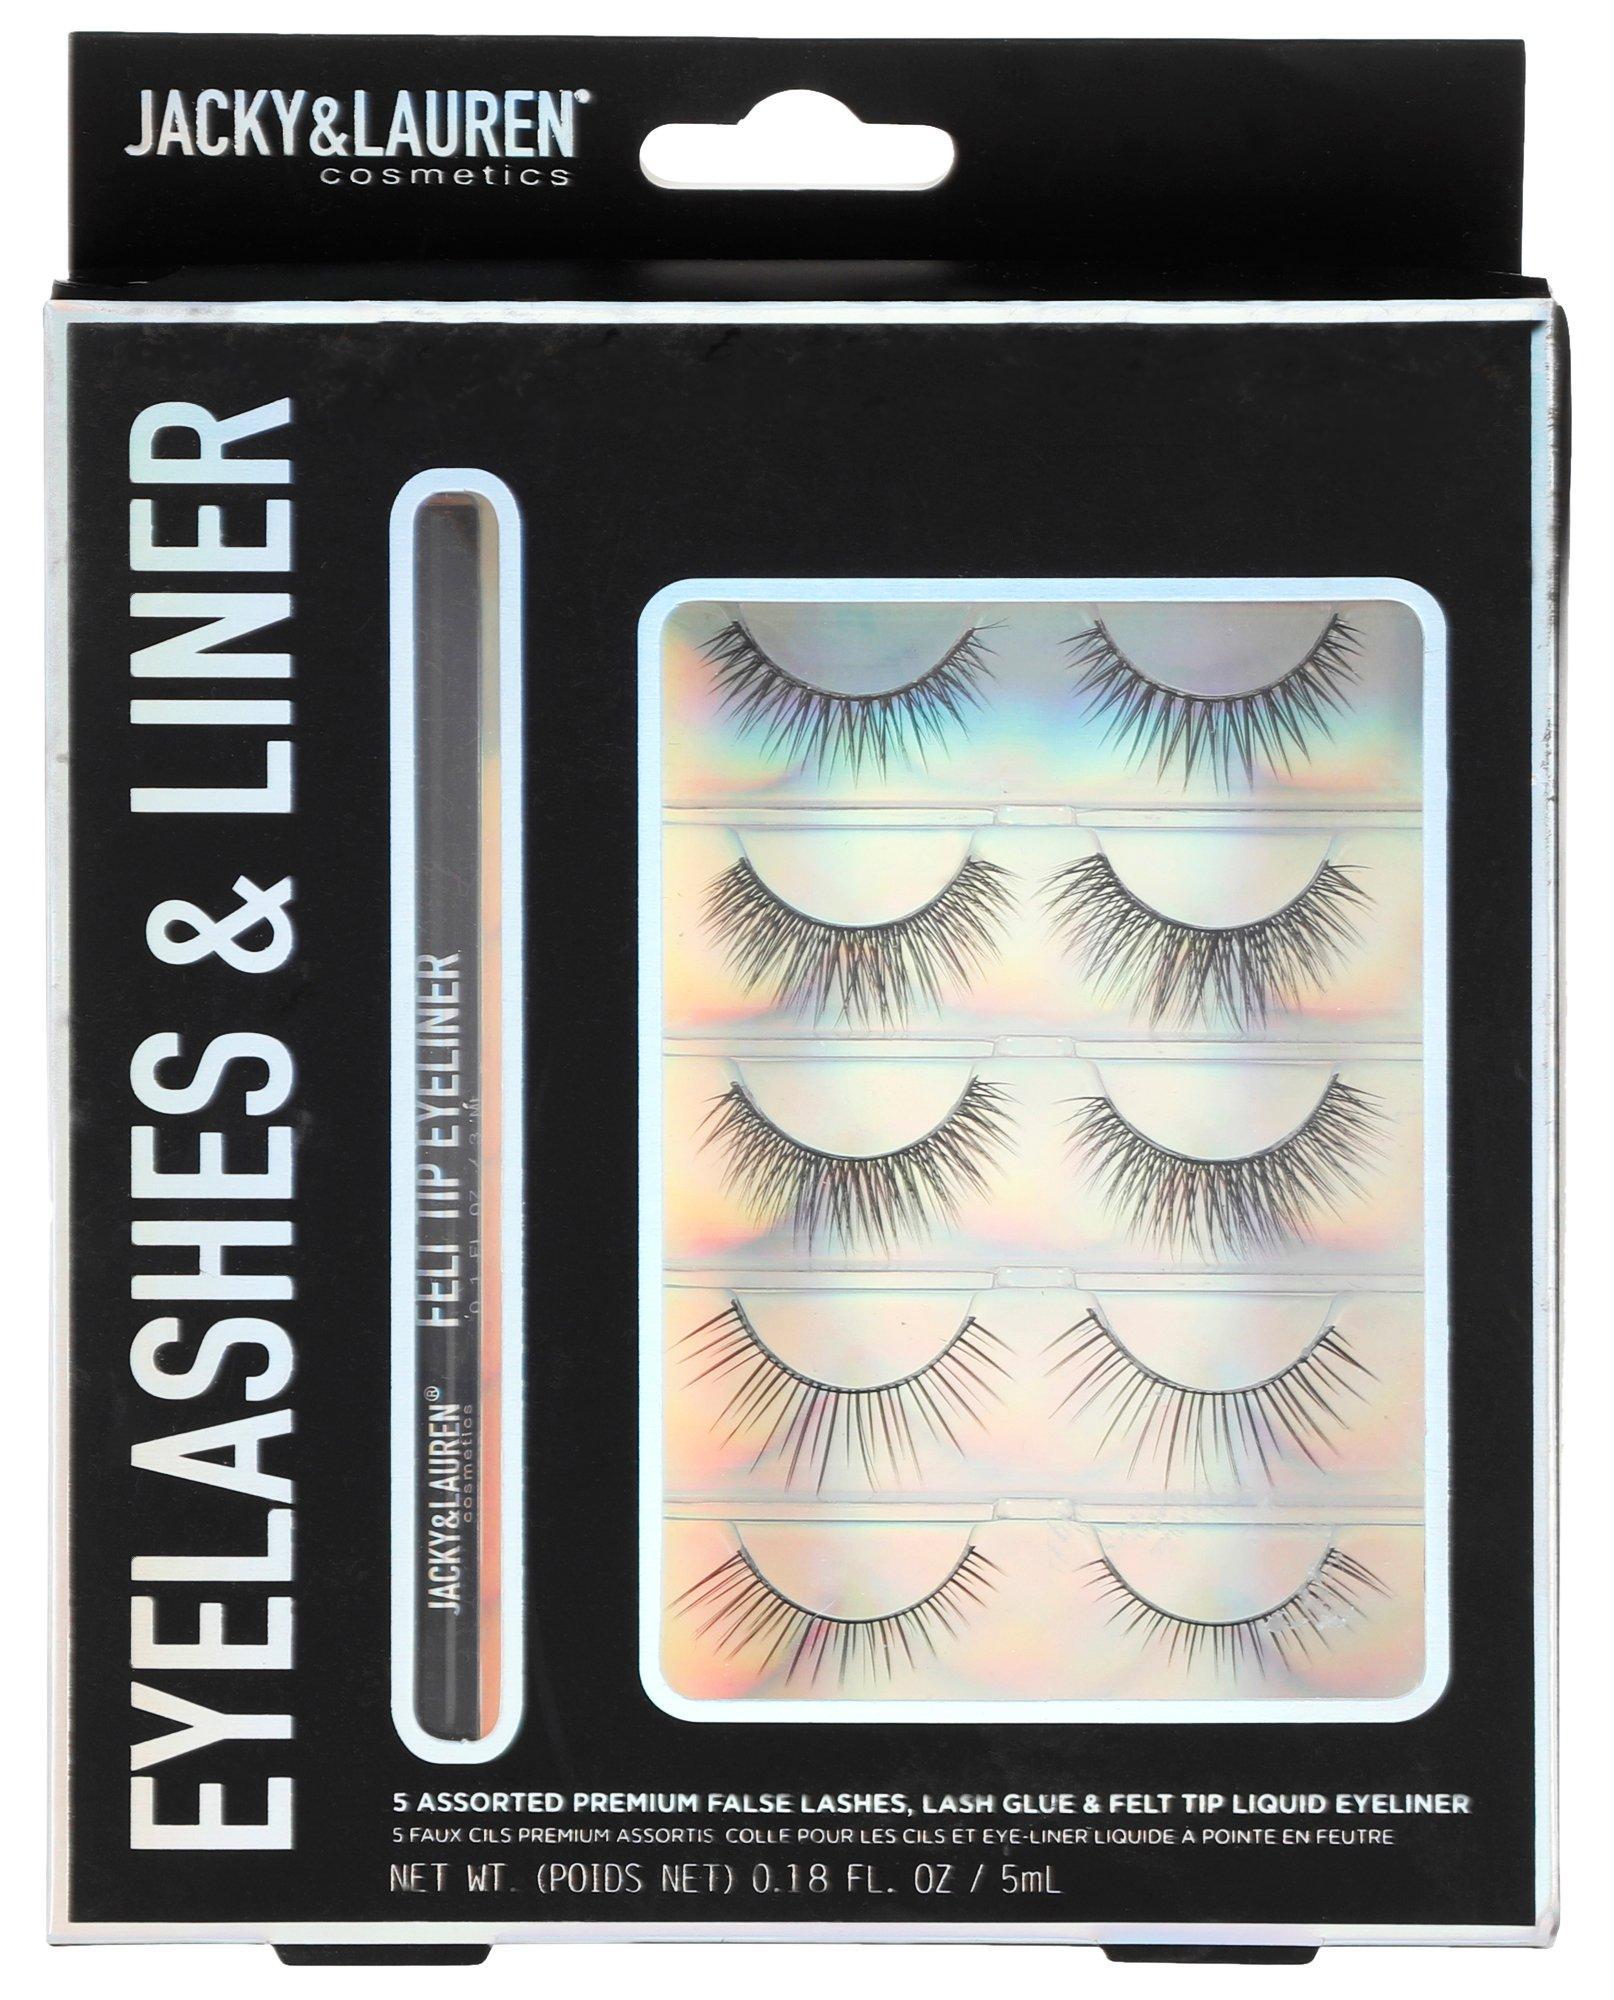 febf4882079 Glintz. Volumize Eye 5 Pr Premium Lashes Set · You save 50%$4.99Compare at  $10.00